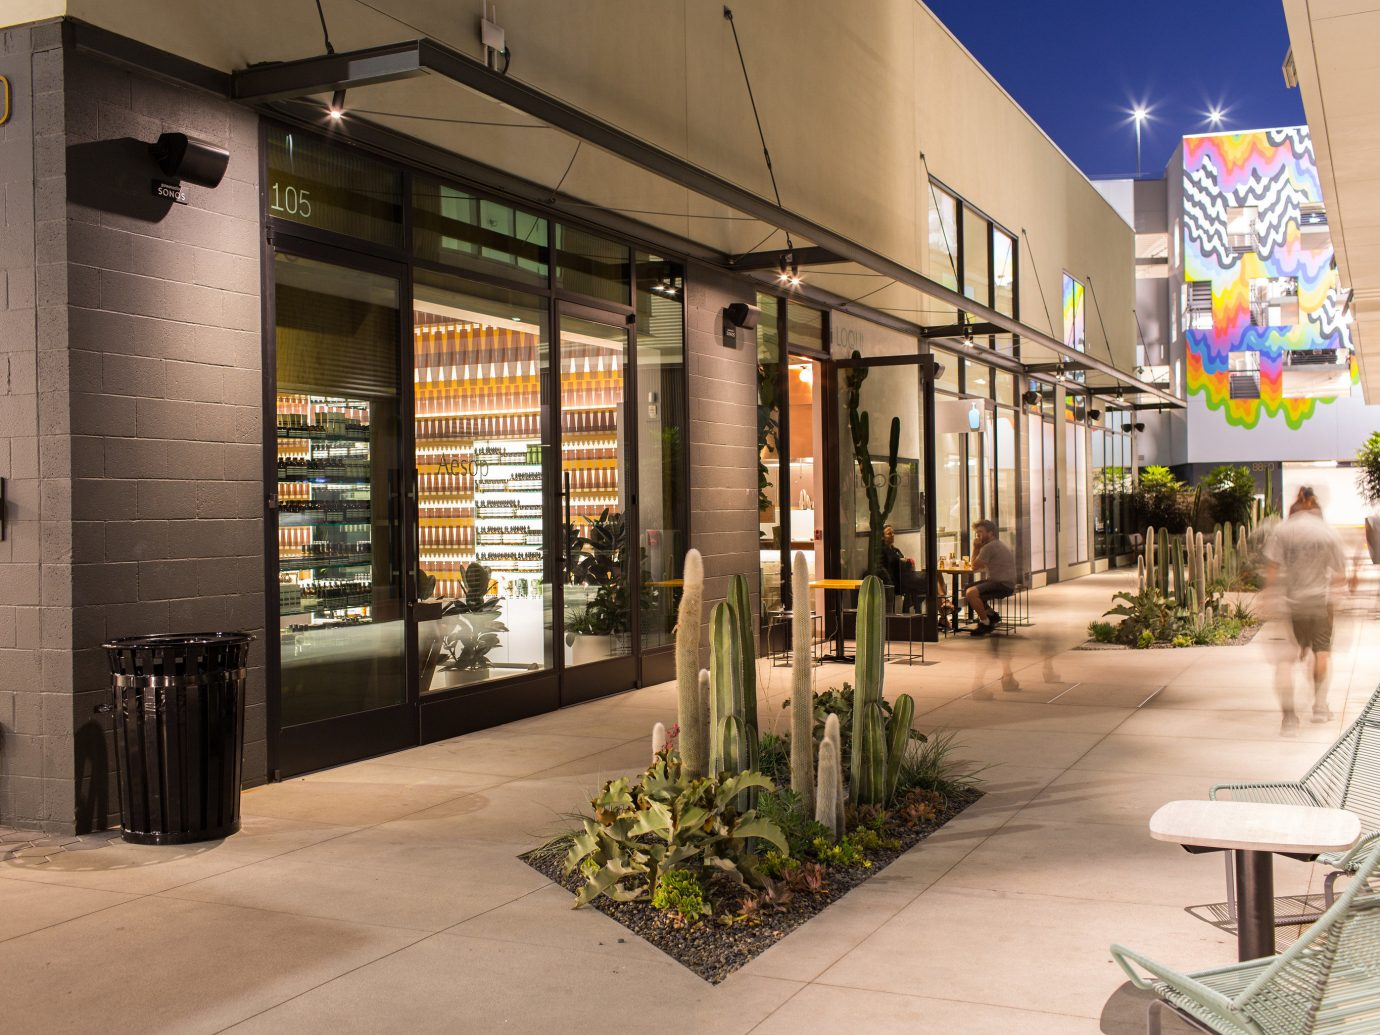 Arts + Culture Hotels Jetsetter Guides shopping Travel Trends Trip Ideas real estate interior design sidewalk